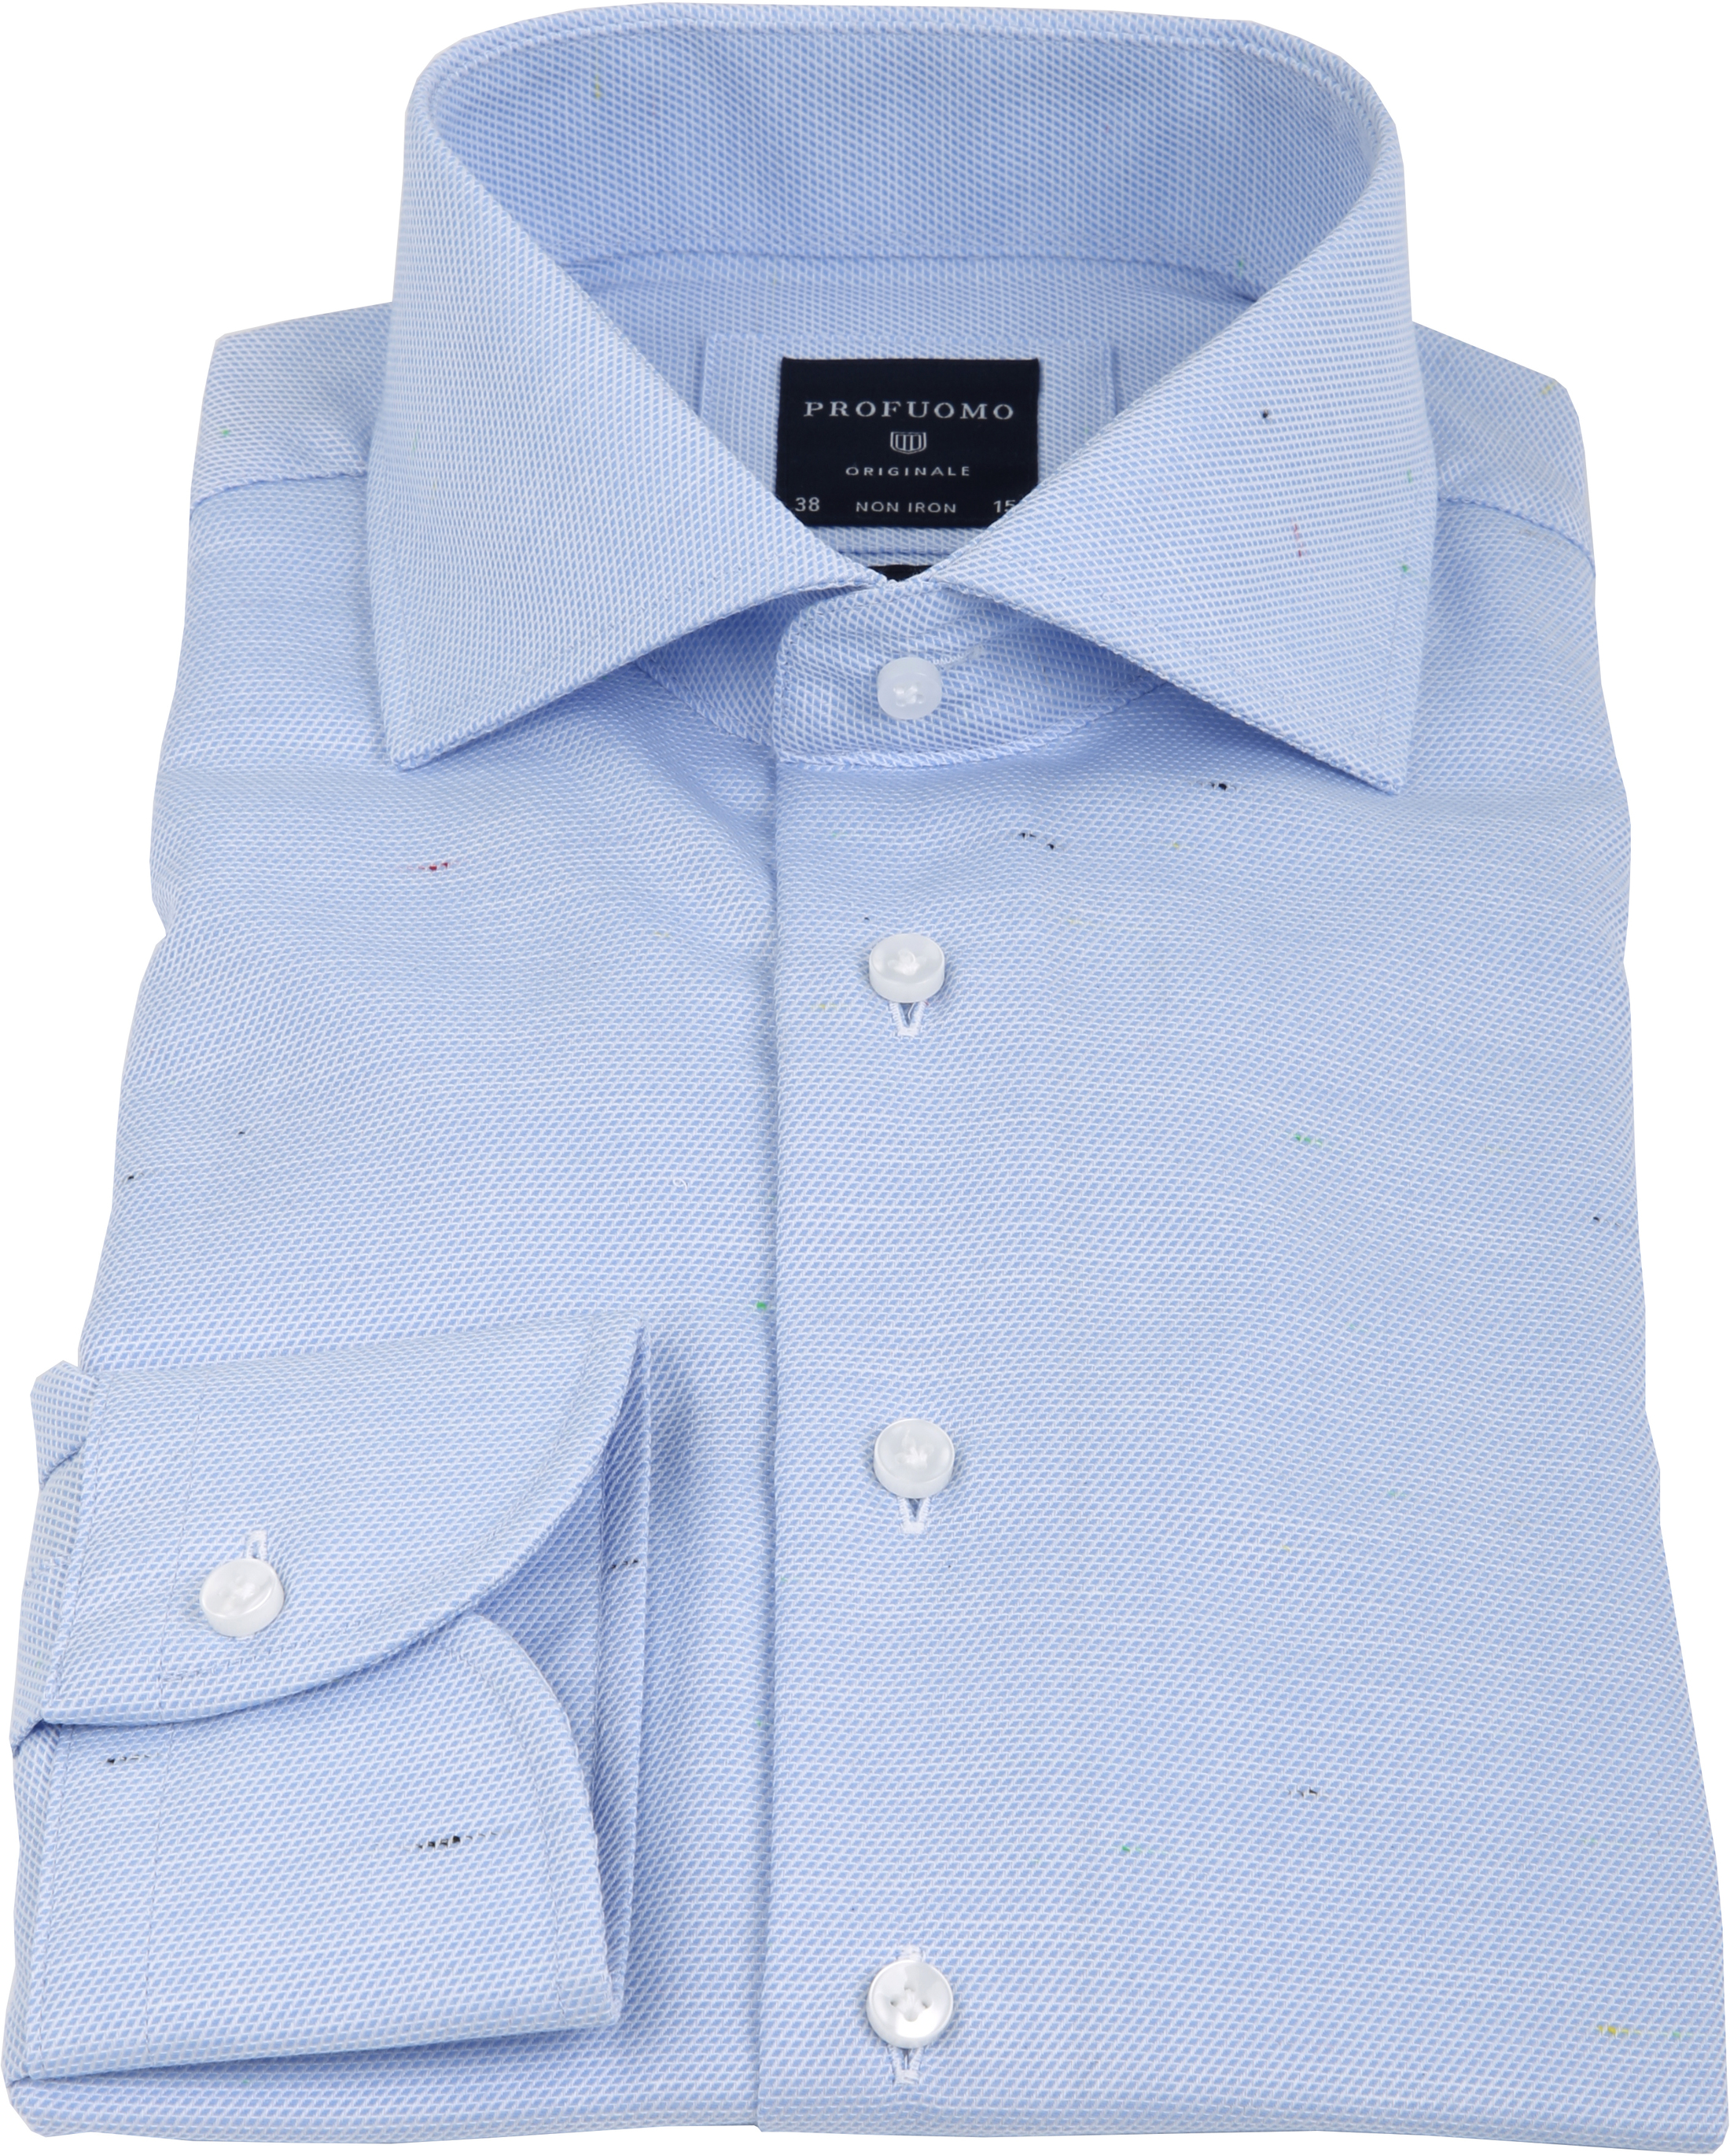 Profuomo Overhemd Dessin Blauw CAW foto 3